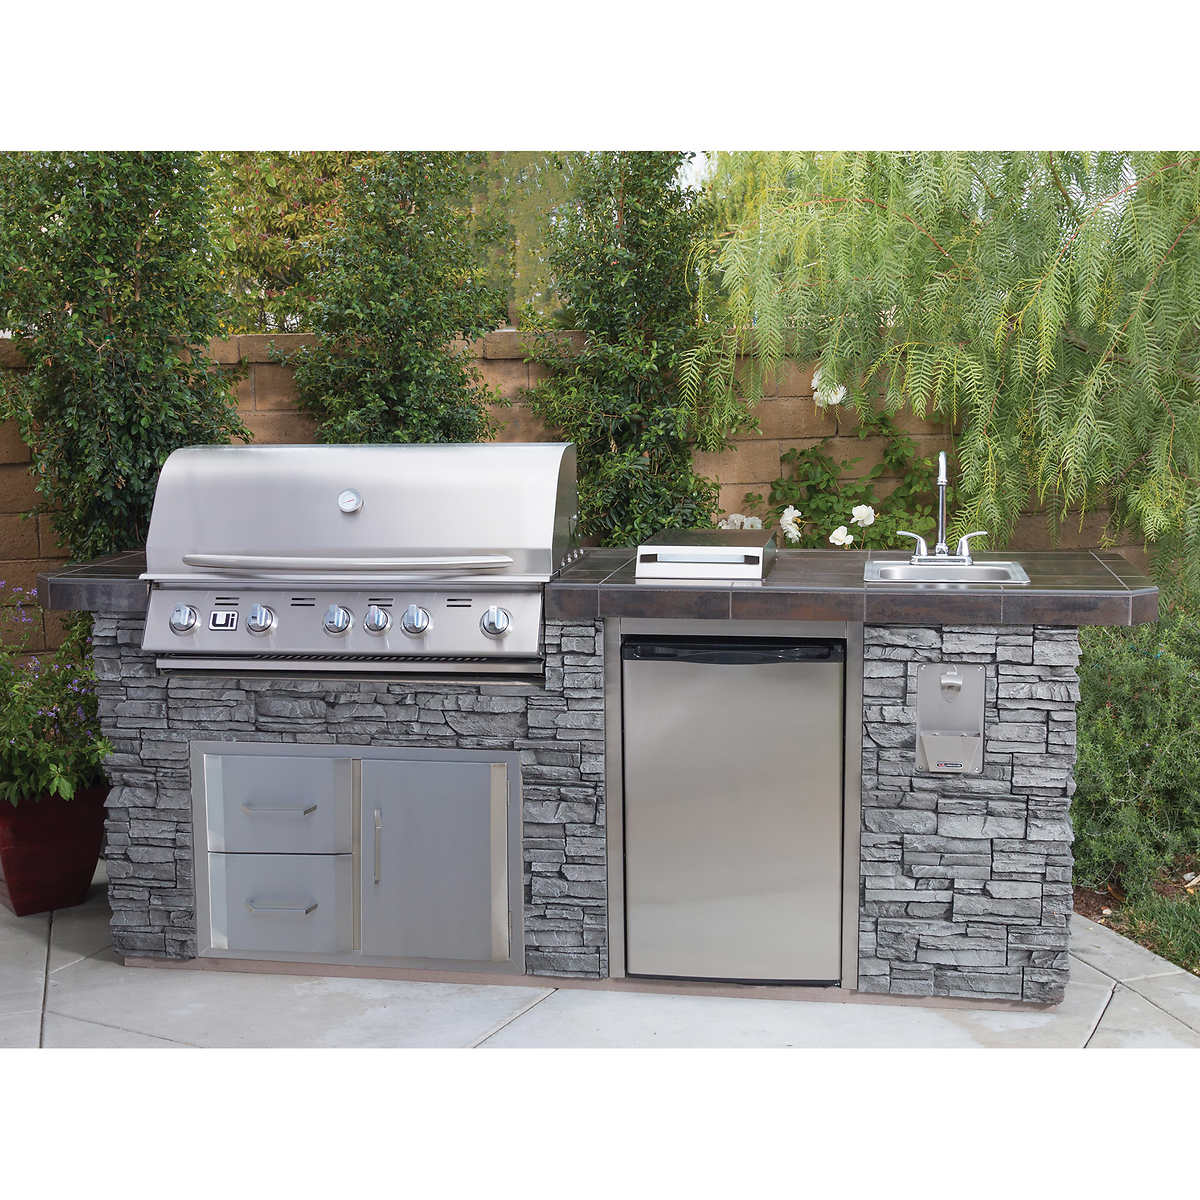 Deluxe Outdoor Patio BBQ Grill Island Propane 5-Burner ... on Backyard Patio Grill Island id=43034